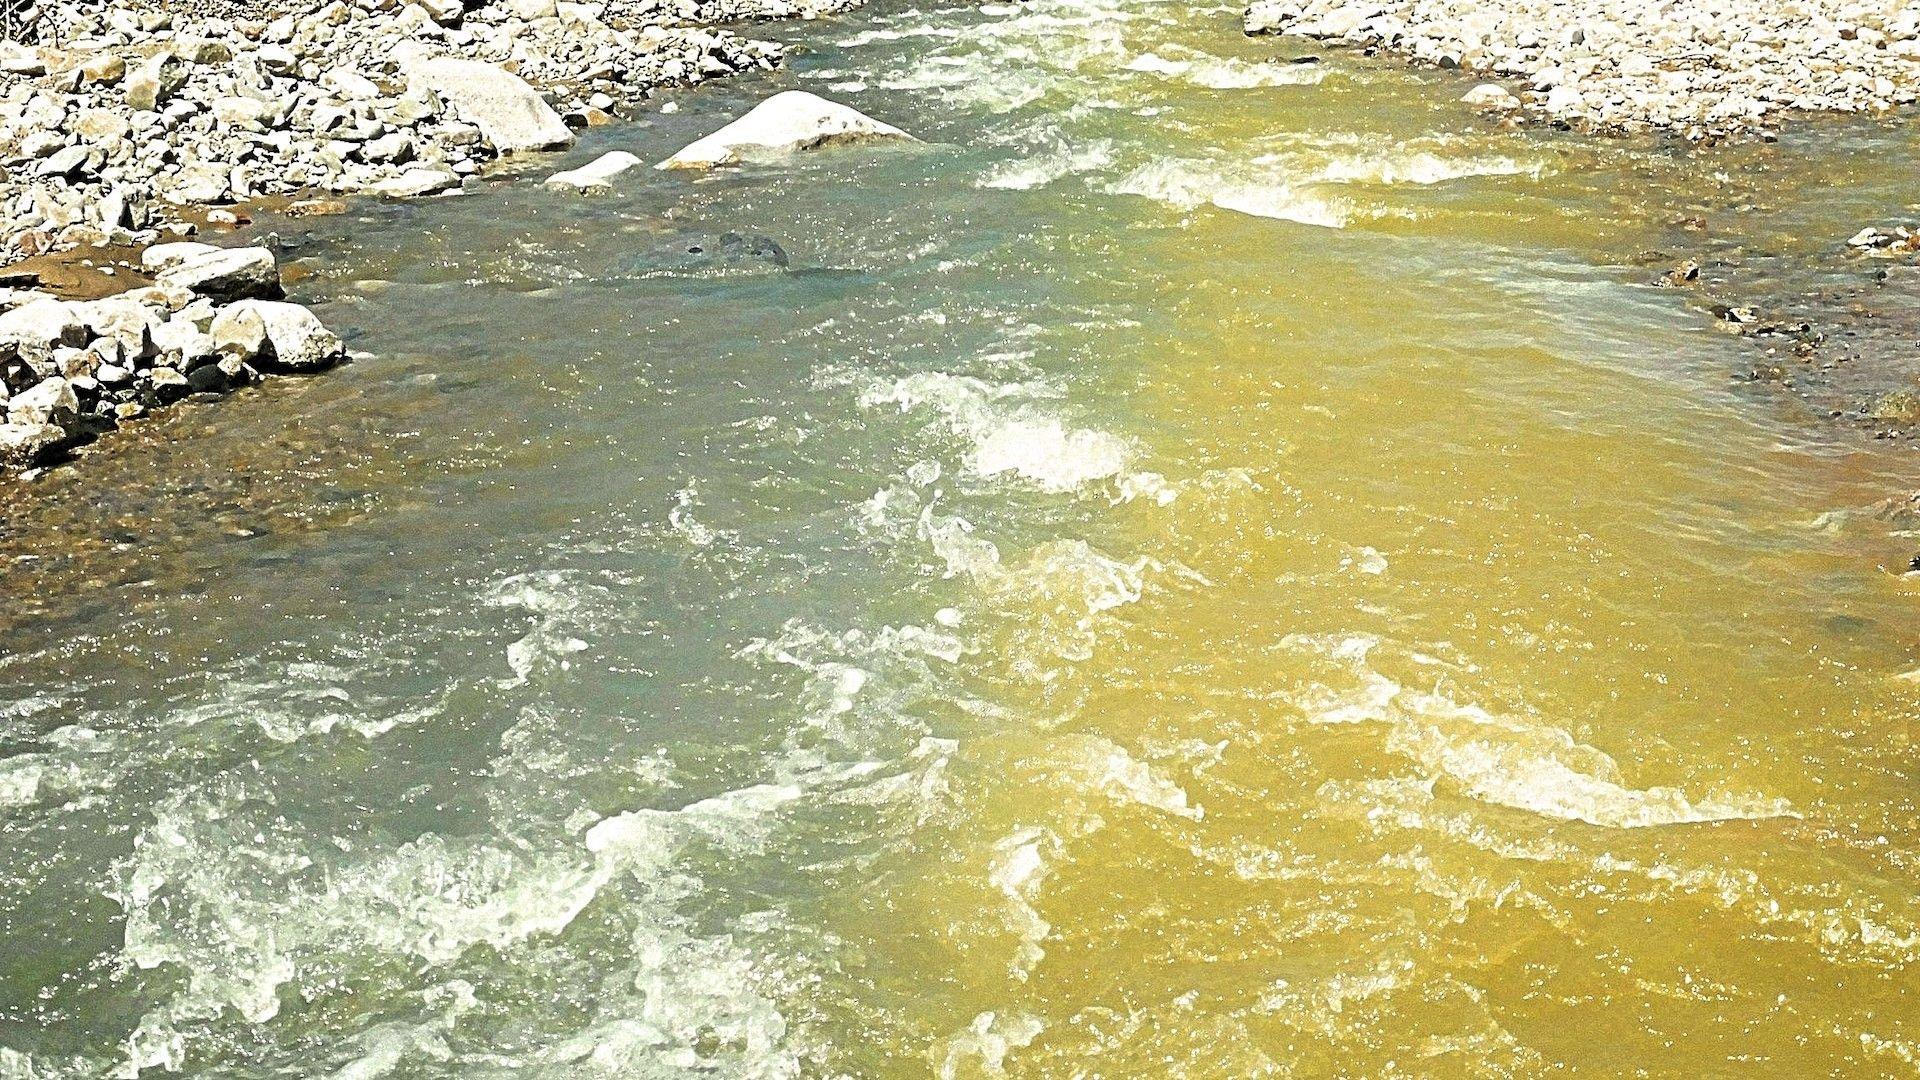 rio-dos-colores-rioja-argentina-13032018in2.jpg